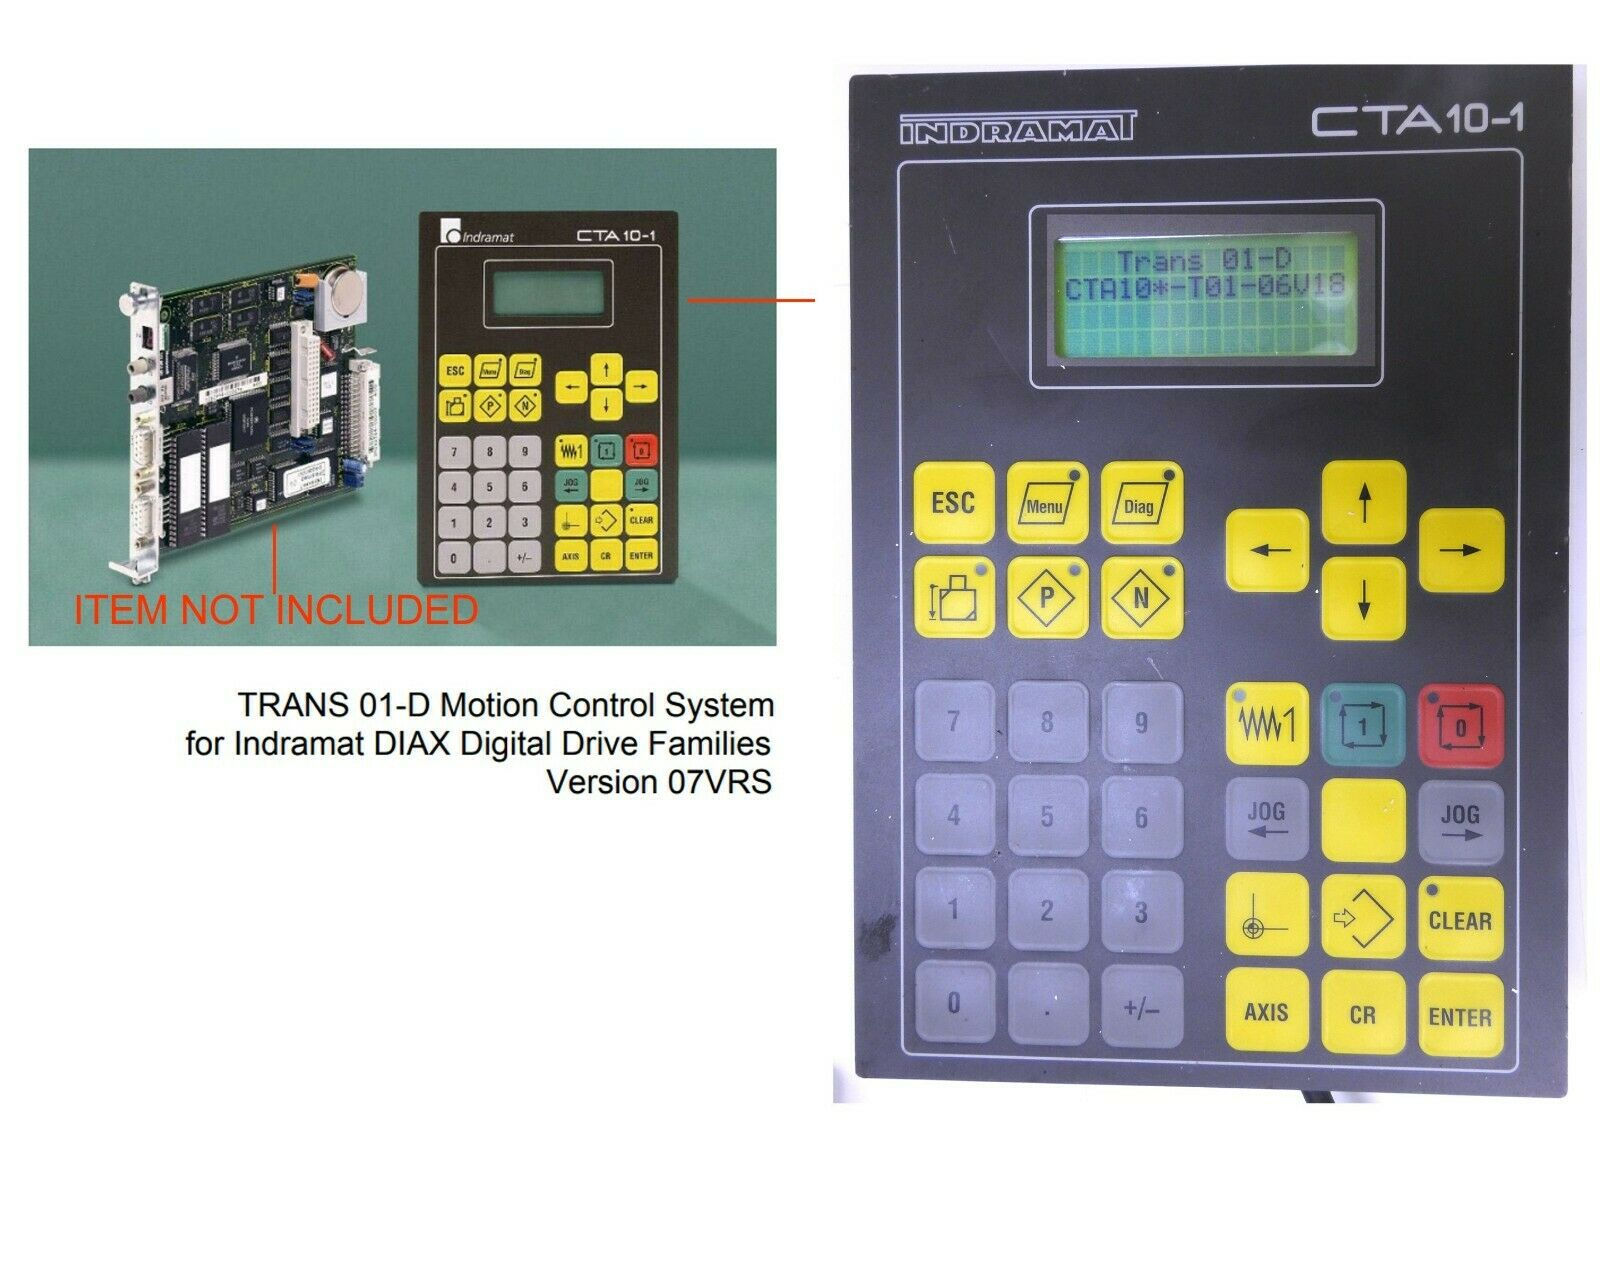 Indramat CTA10-1 User Interface